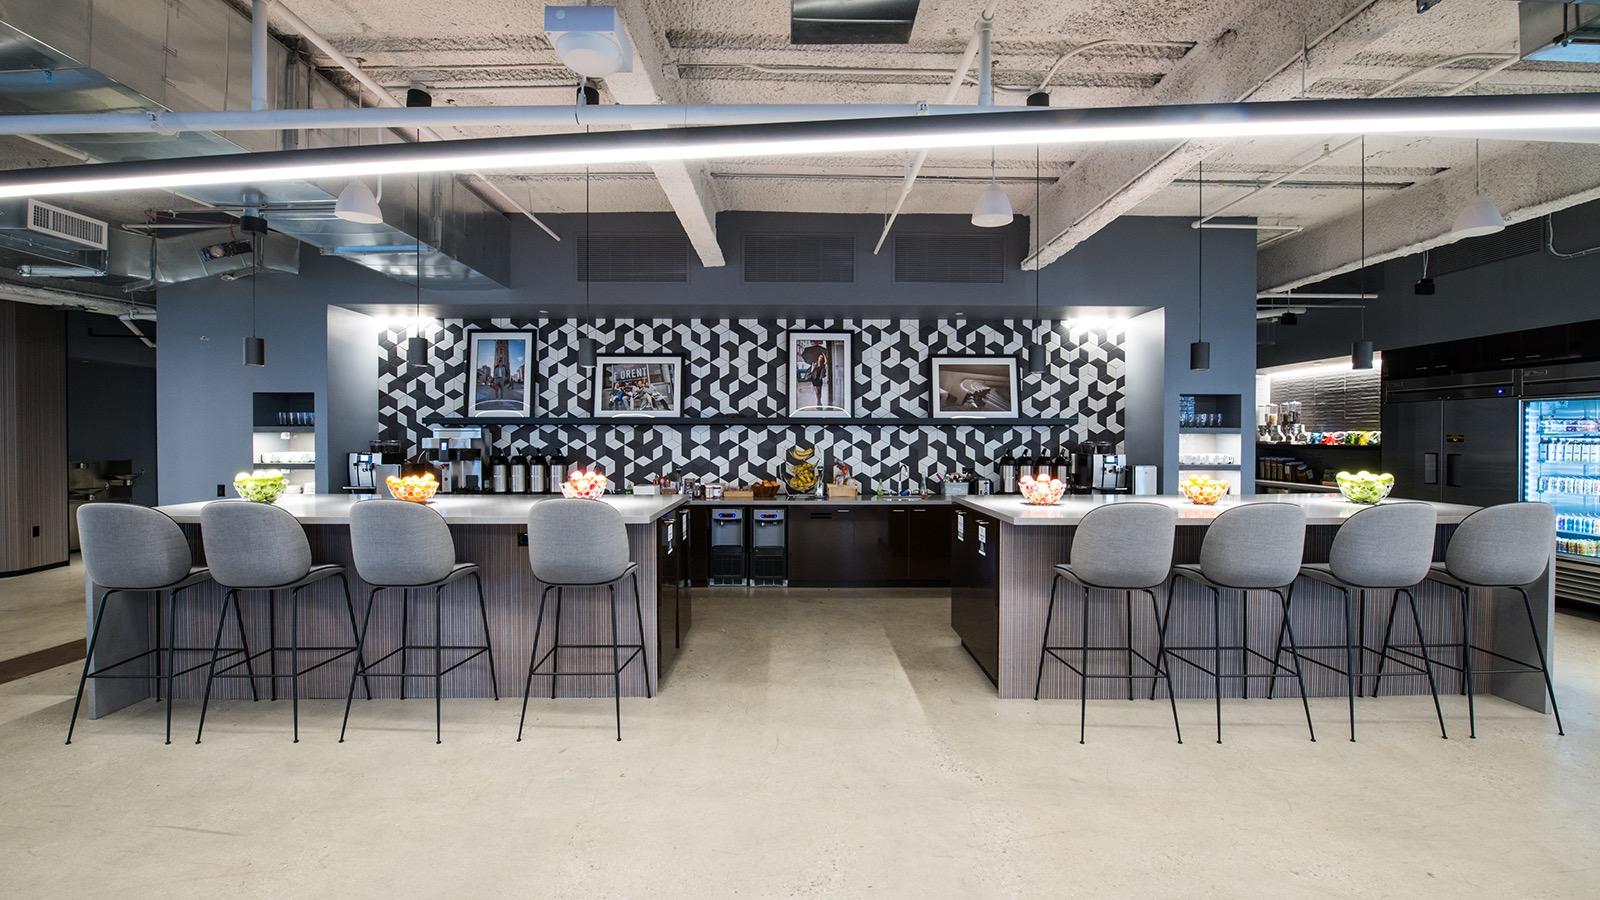 vox-media-nyc-office-9